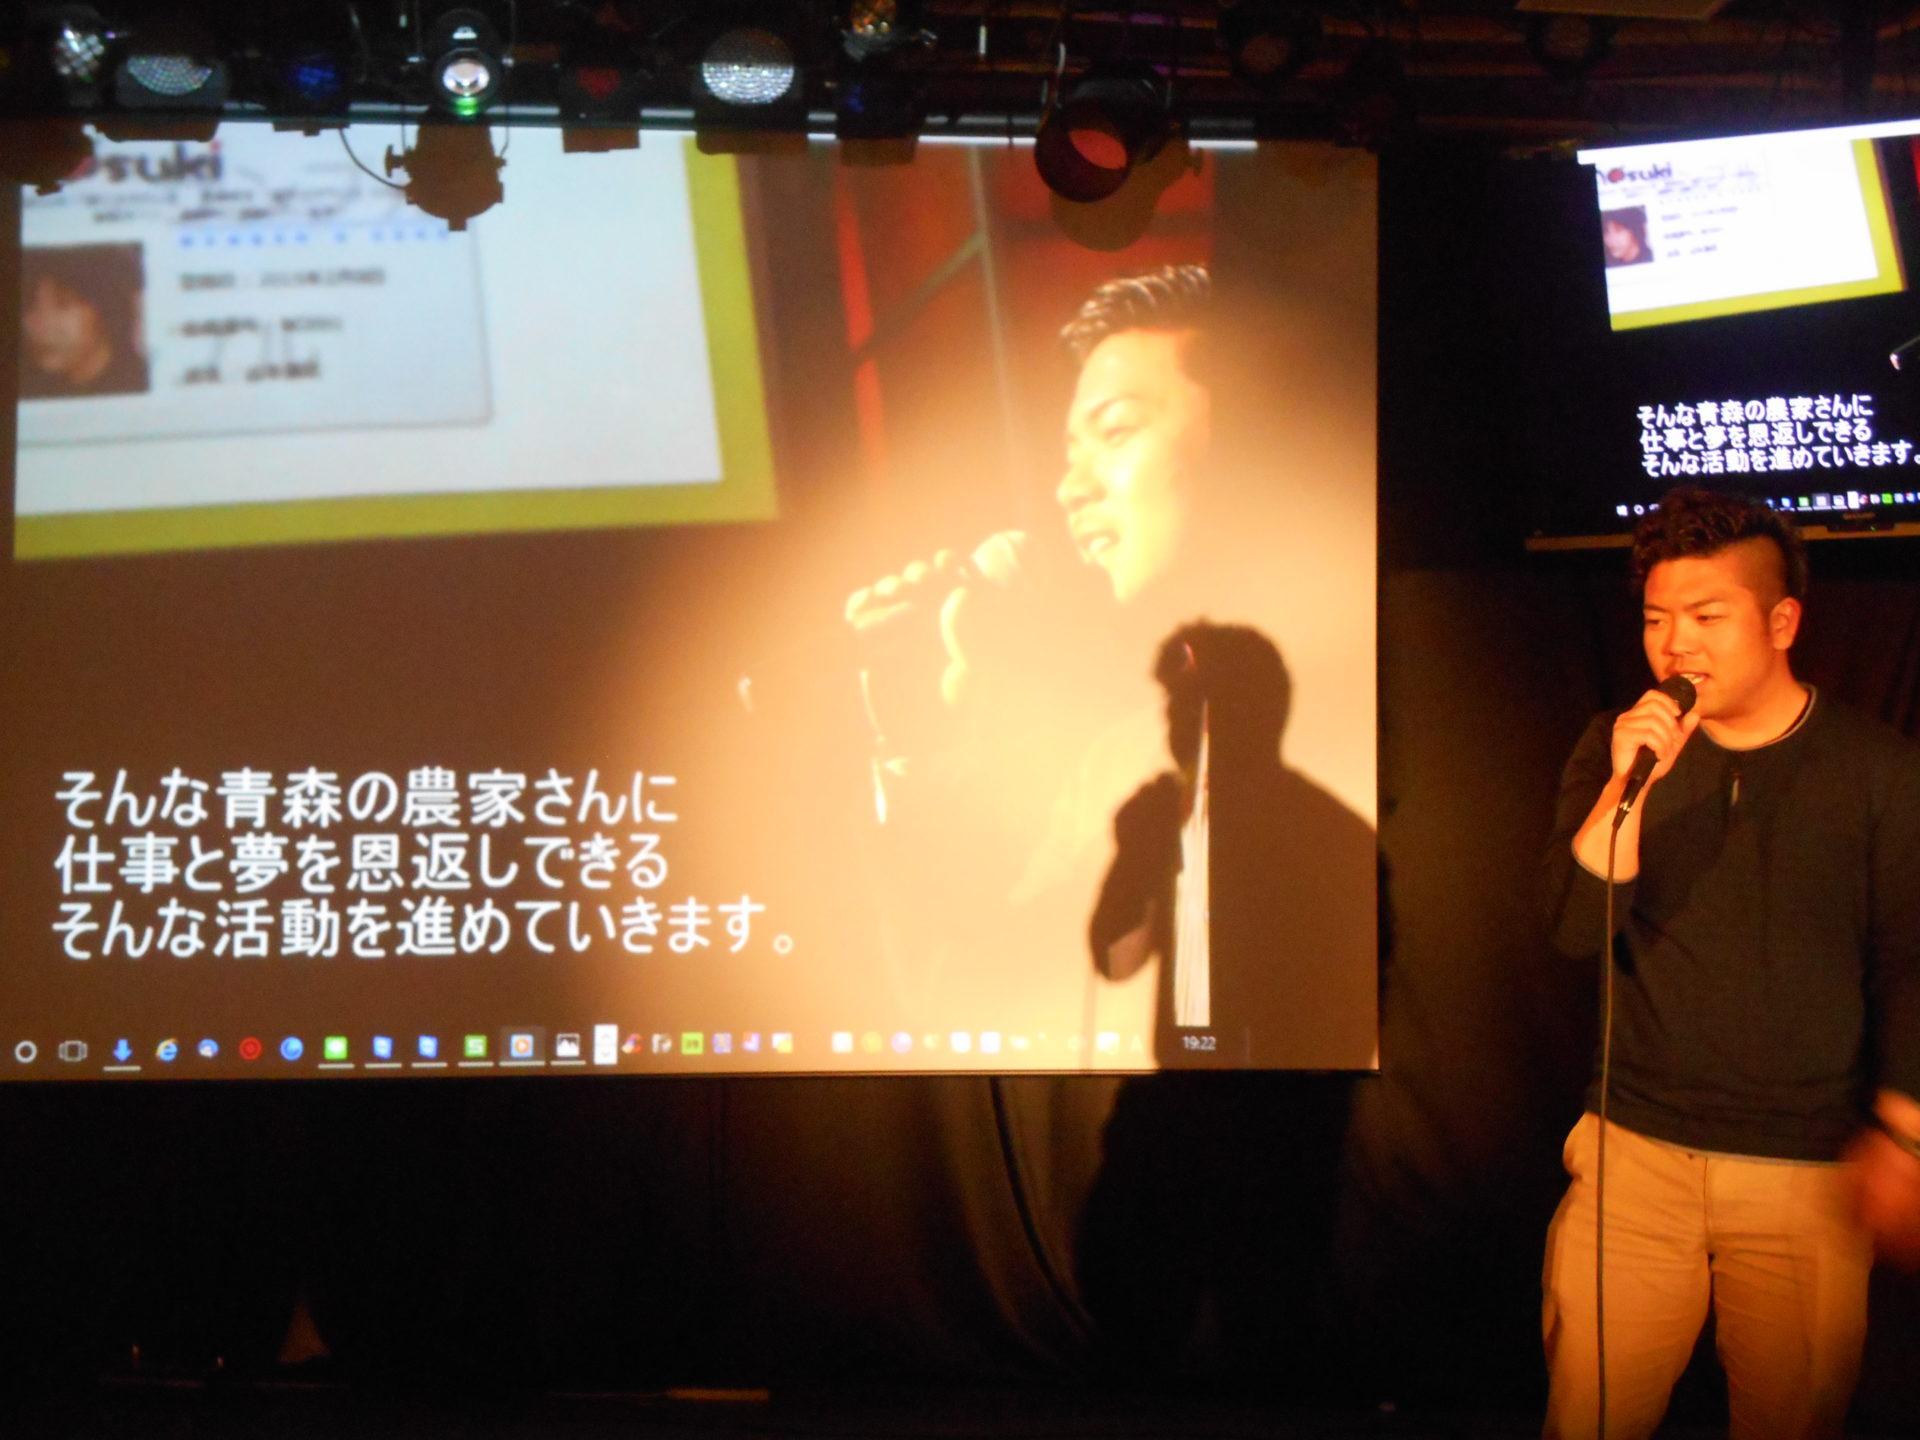 DSCN1025 1920x1440 - 2016年3月11日(金)AOsuki総会&パーティー開催しました。